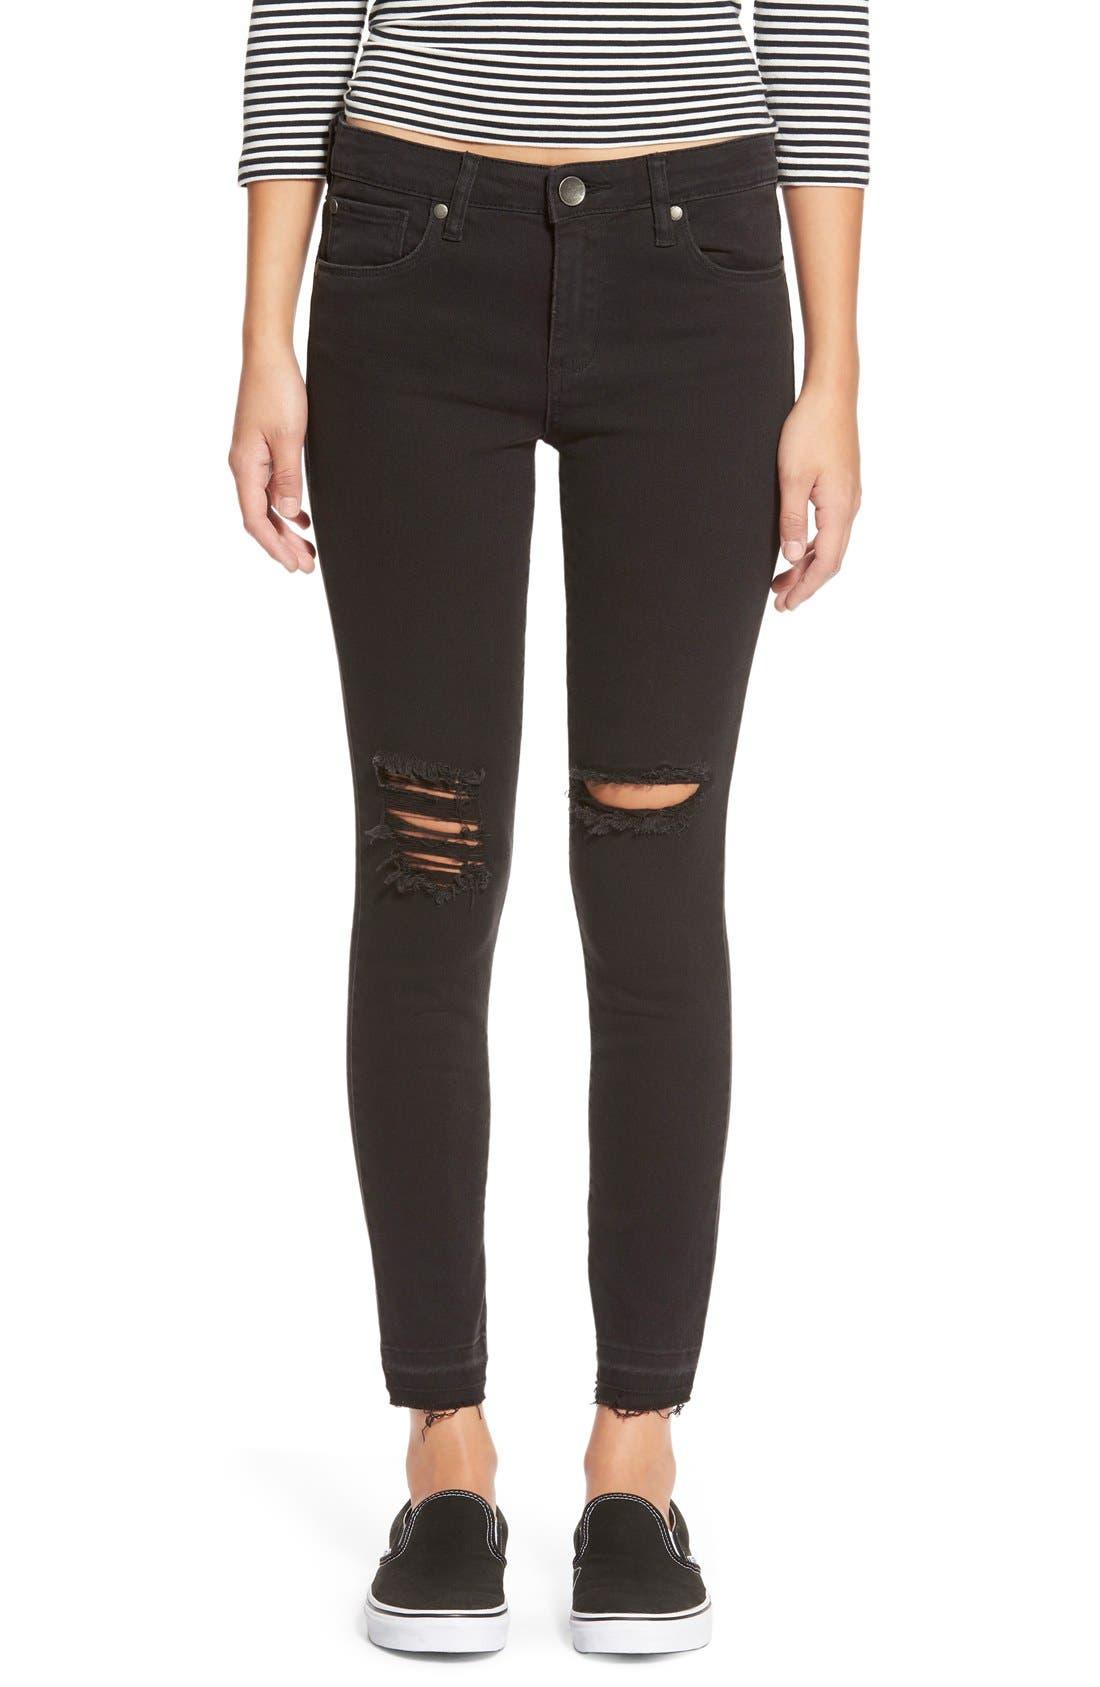 Alternate Image 1 Selected - STSBlue 'Emma' Distressed High Rise Ankle Skinny Jeans (Black)